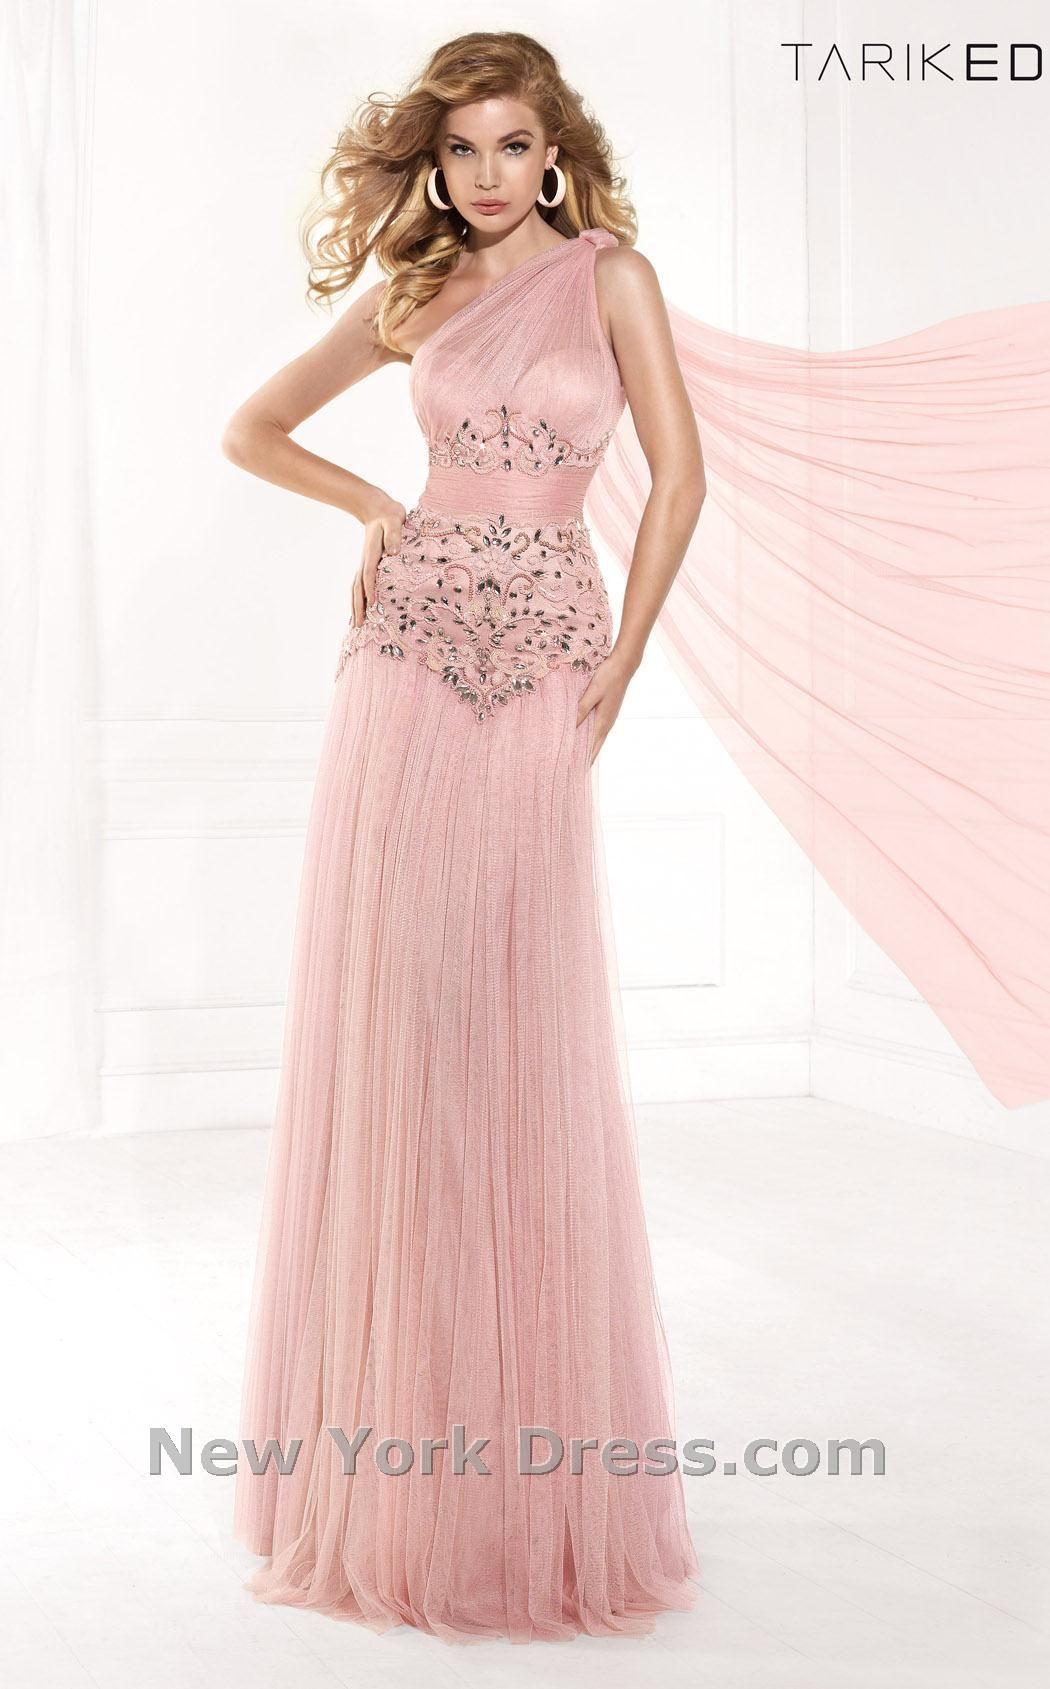 newyorkdress.com | Gorgeous Dresses | Pinterest